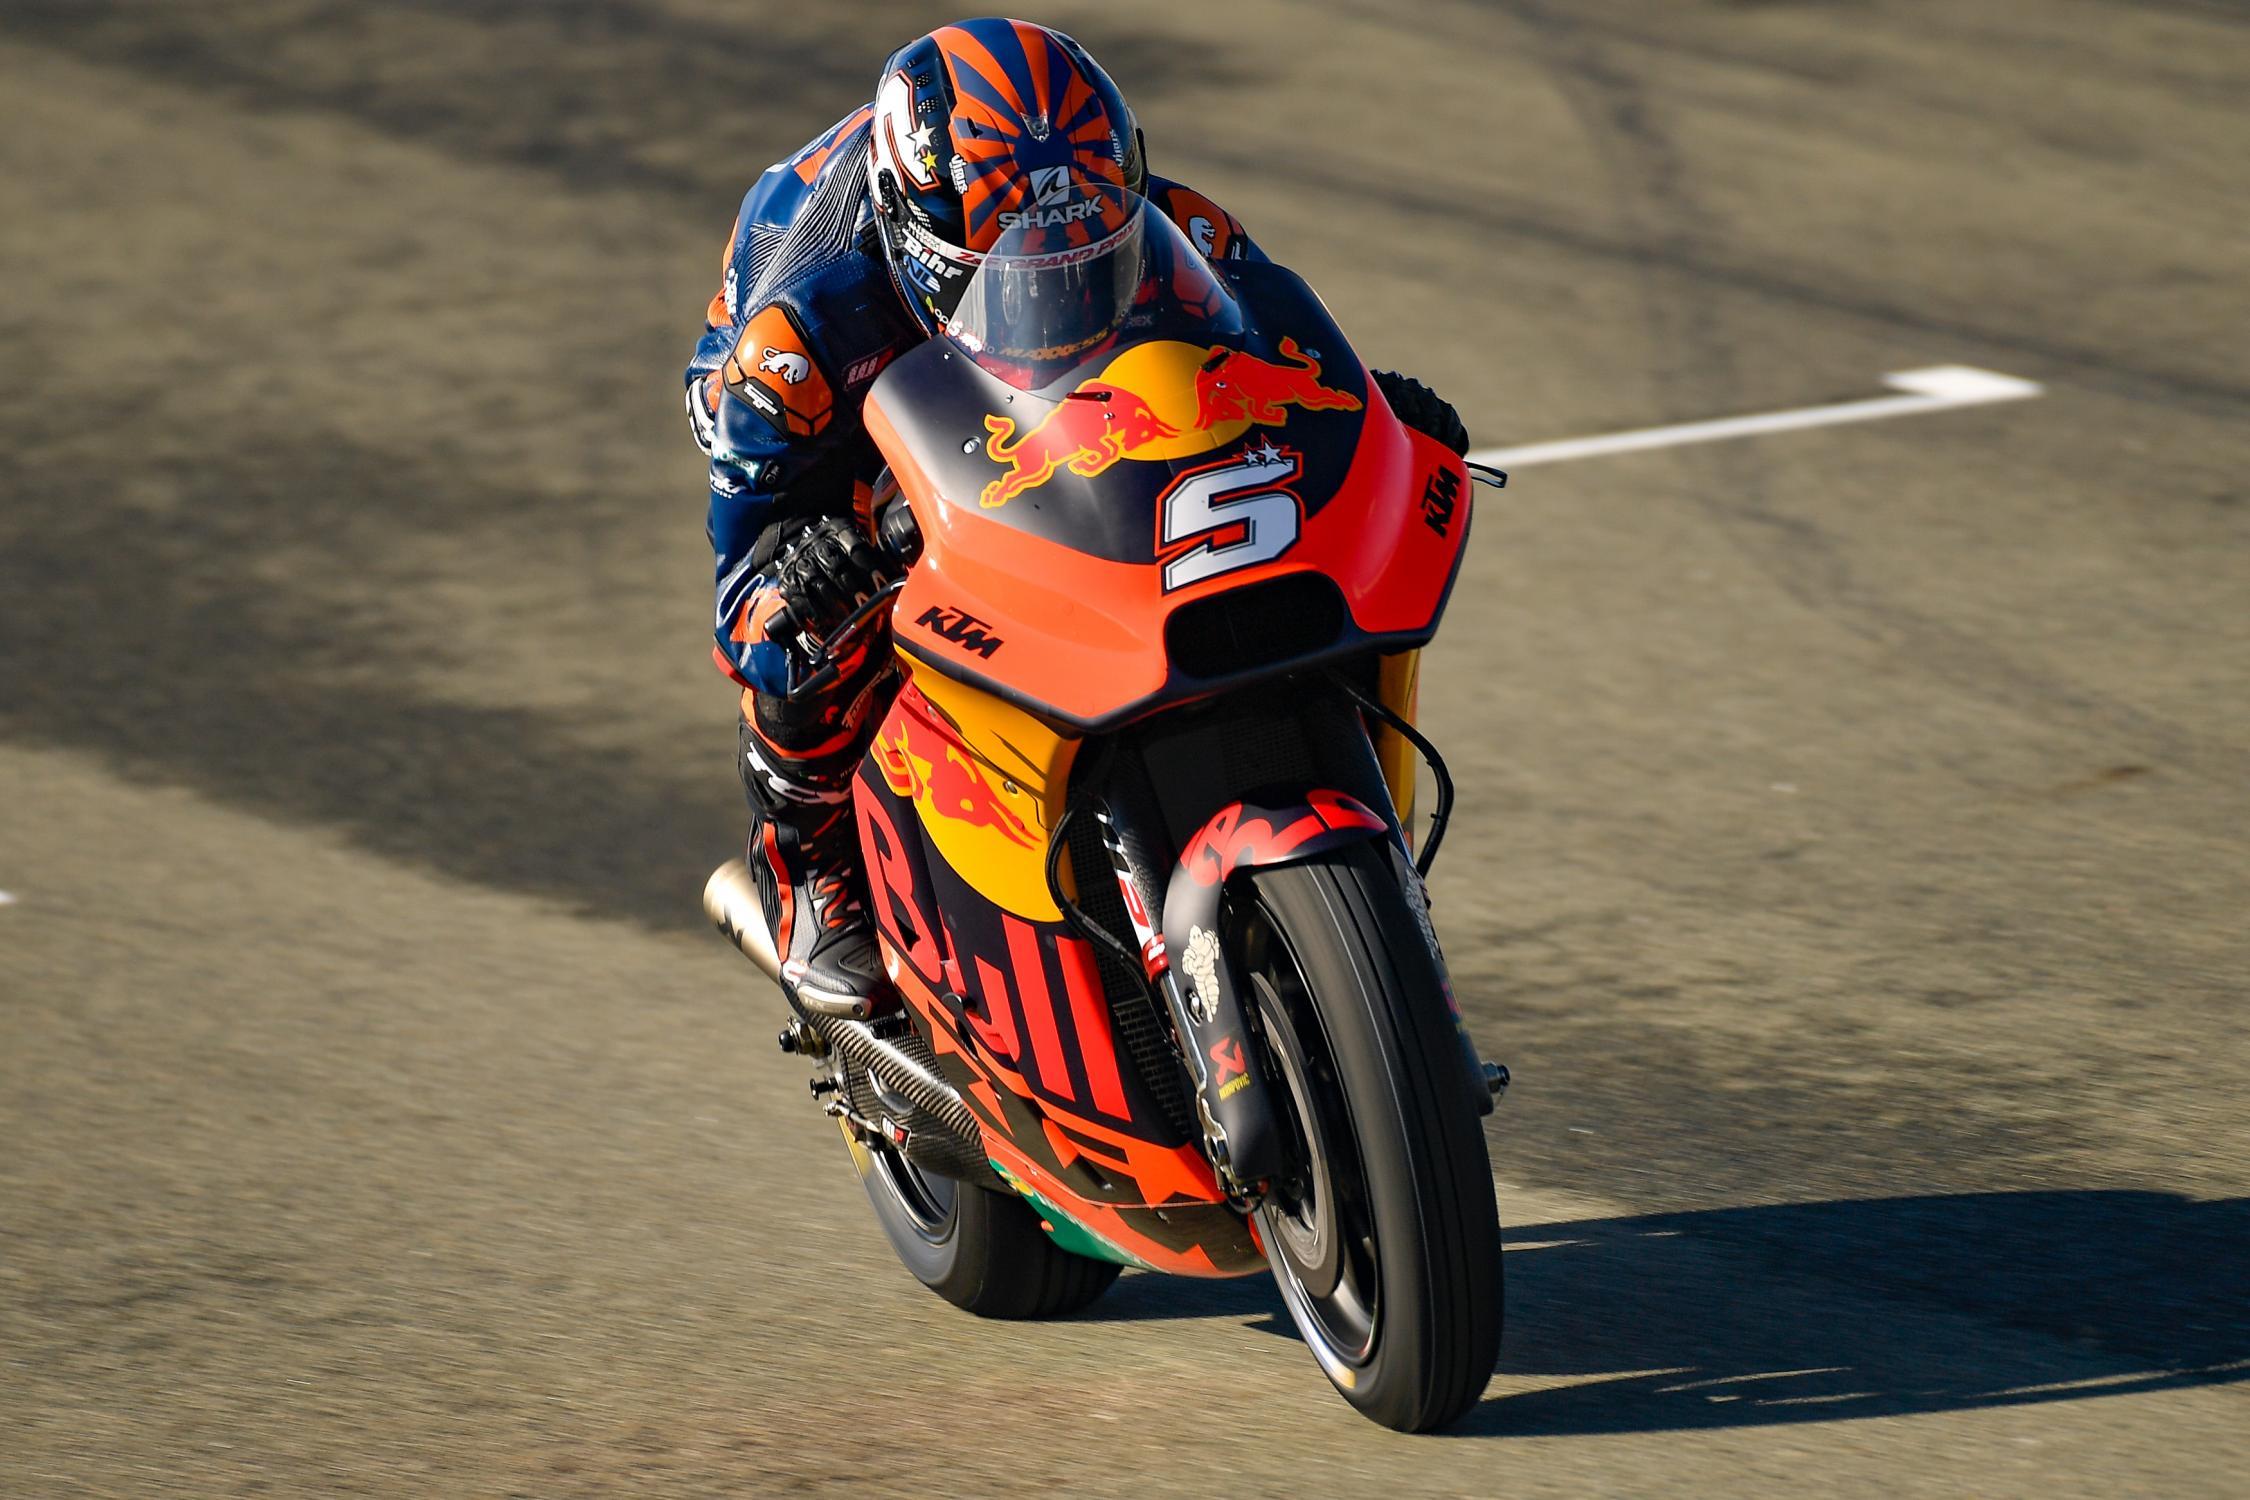 MOTO GP 2019 COMPÉTITIONS - Page 2 Johann-zarco-valencia-test-motogp-2018-2